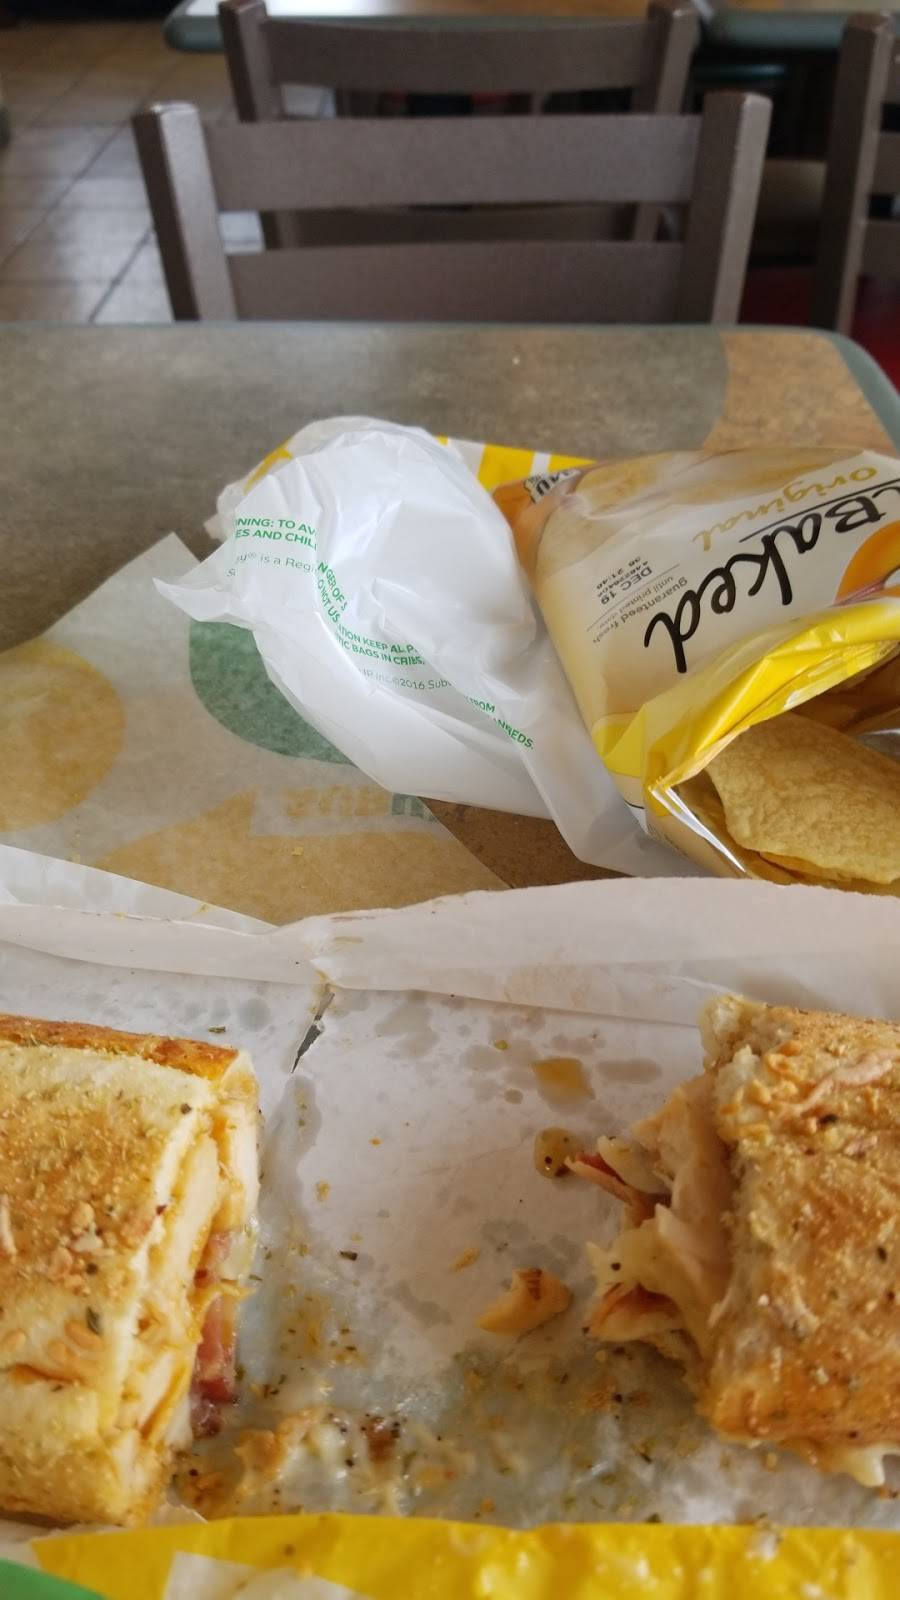 Subway - restaurant    Photo 7 of 9   Address: 5415 Dyer St, El Paso, TX 79904, USA   Phone: (915) 564-0593